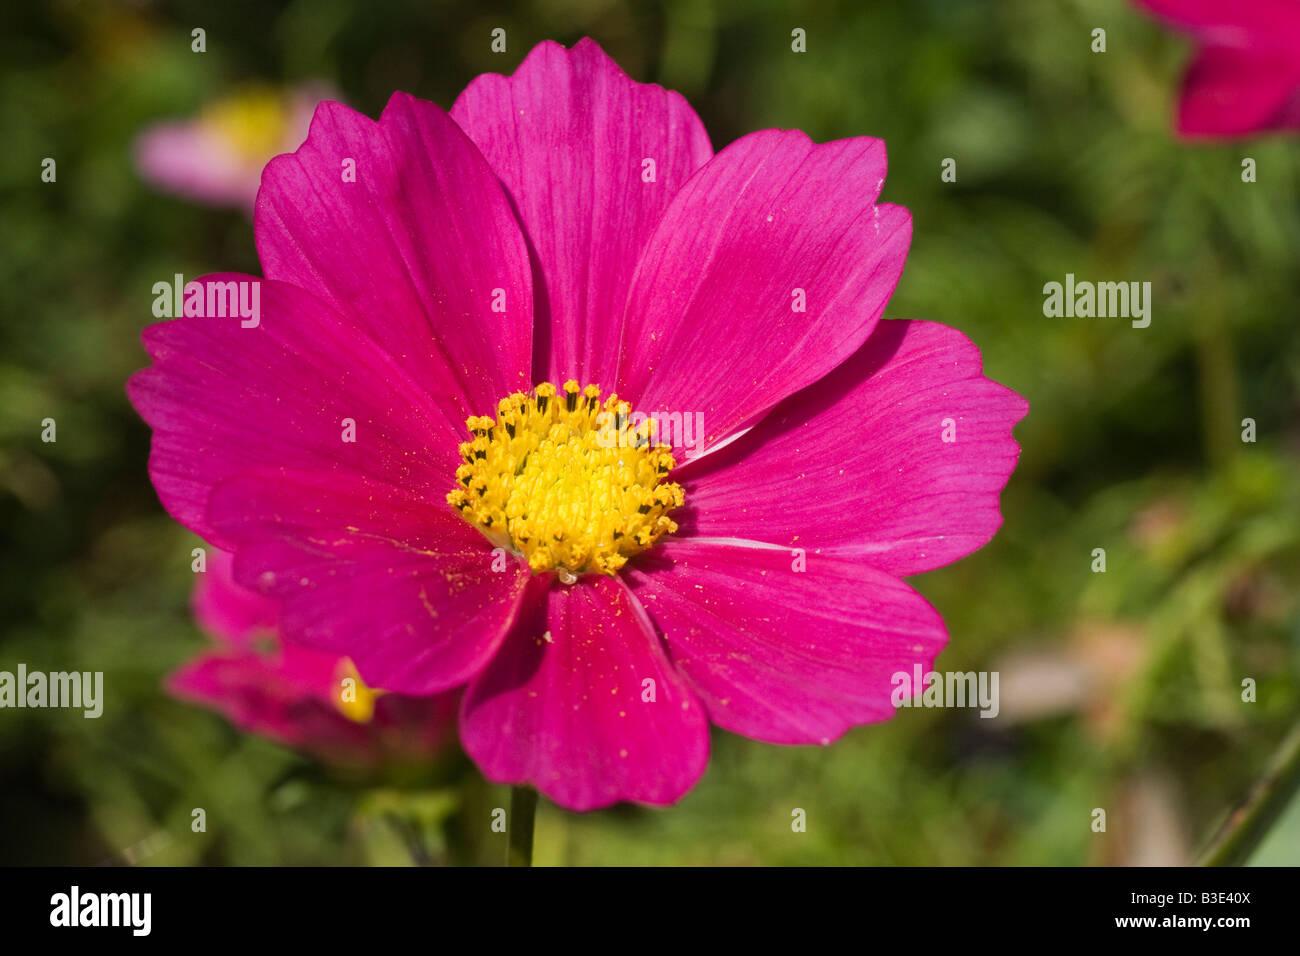 A pink cosmos flower cosmos bipinnatus this species is considered a a pink cosmos flower cosmos bipinnatus this species is considered a half hardy annual august 2008 mightylinksfo